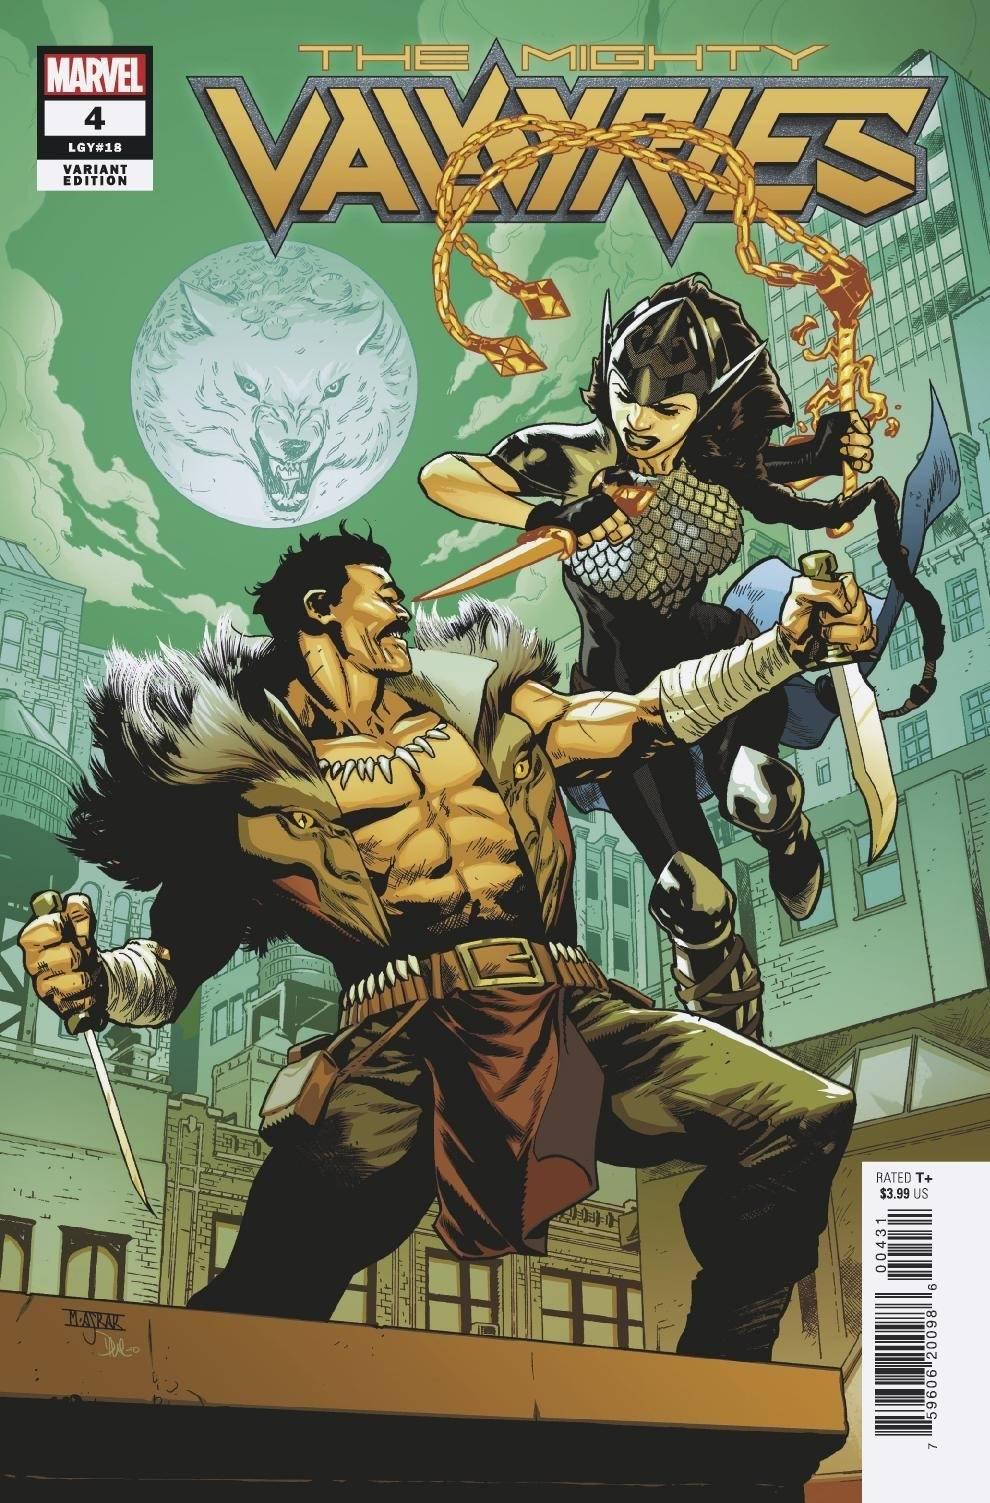 STL194997 ComicList: Marvel Comics New Releases for 07/28/2021